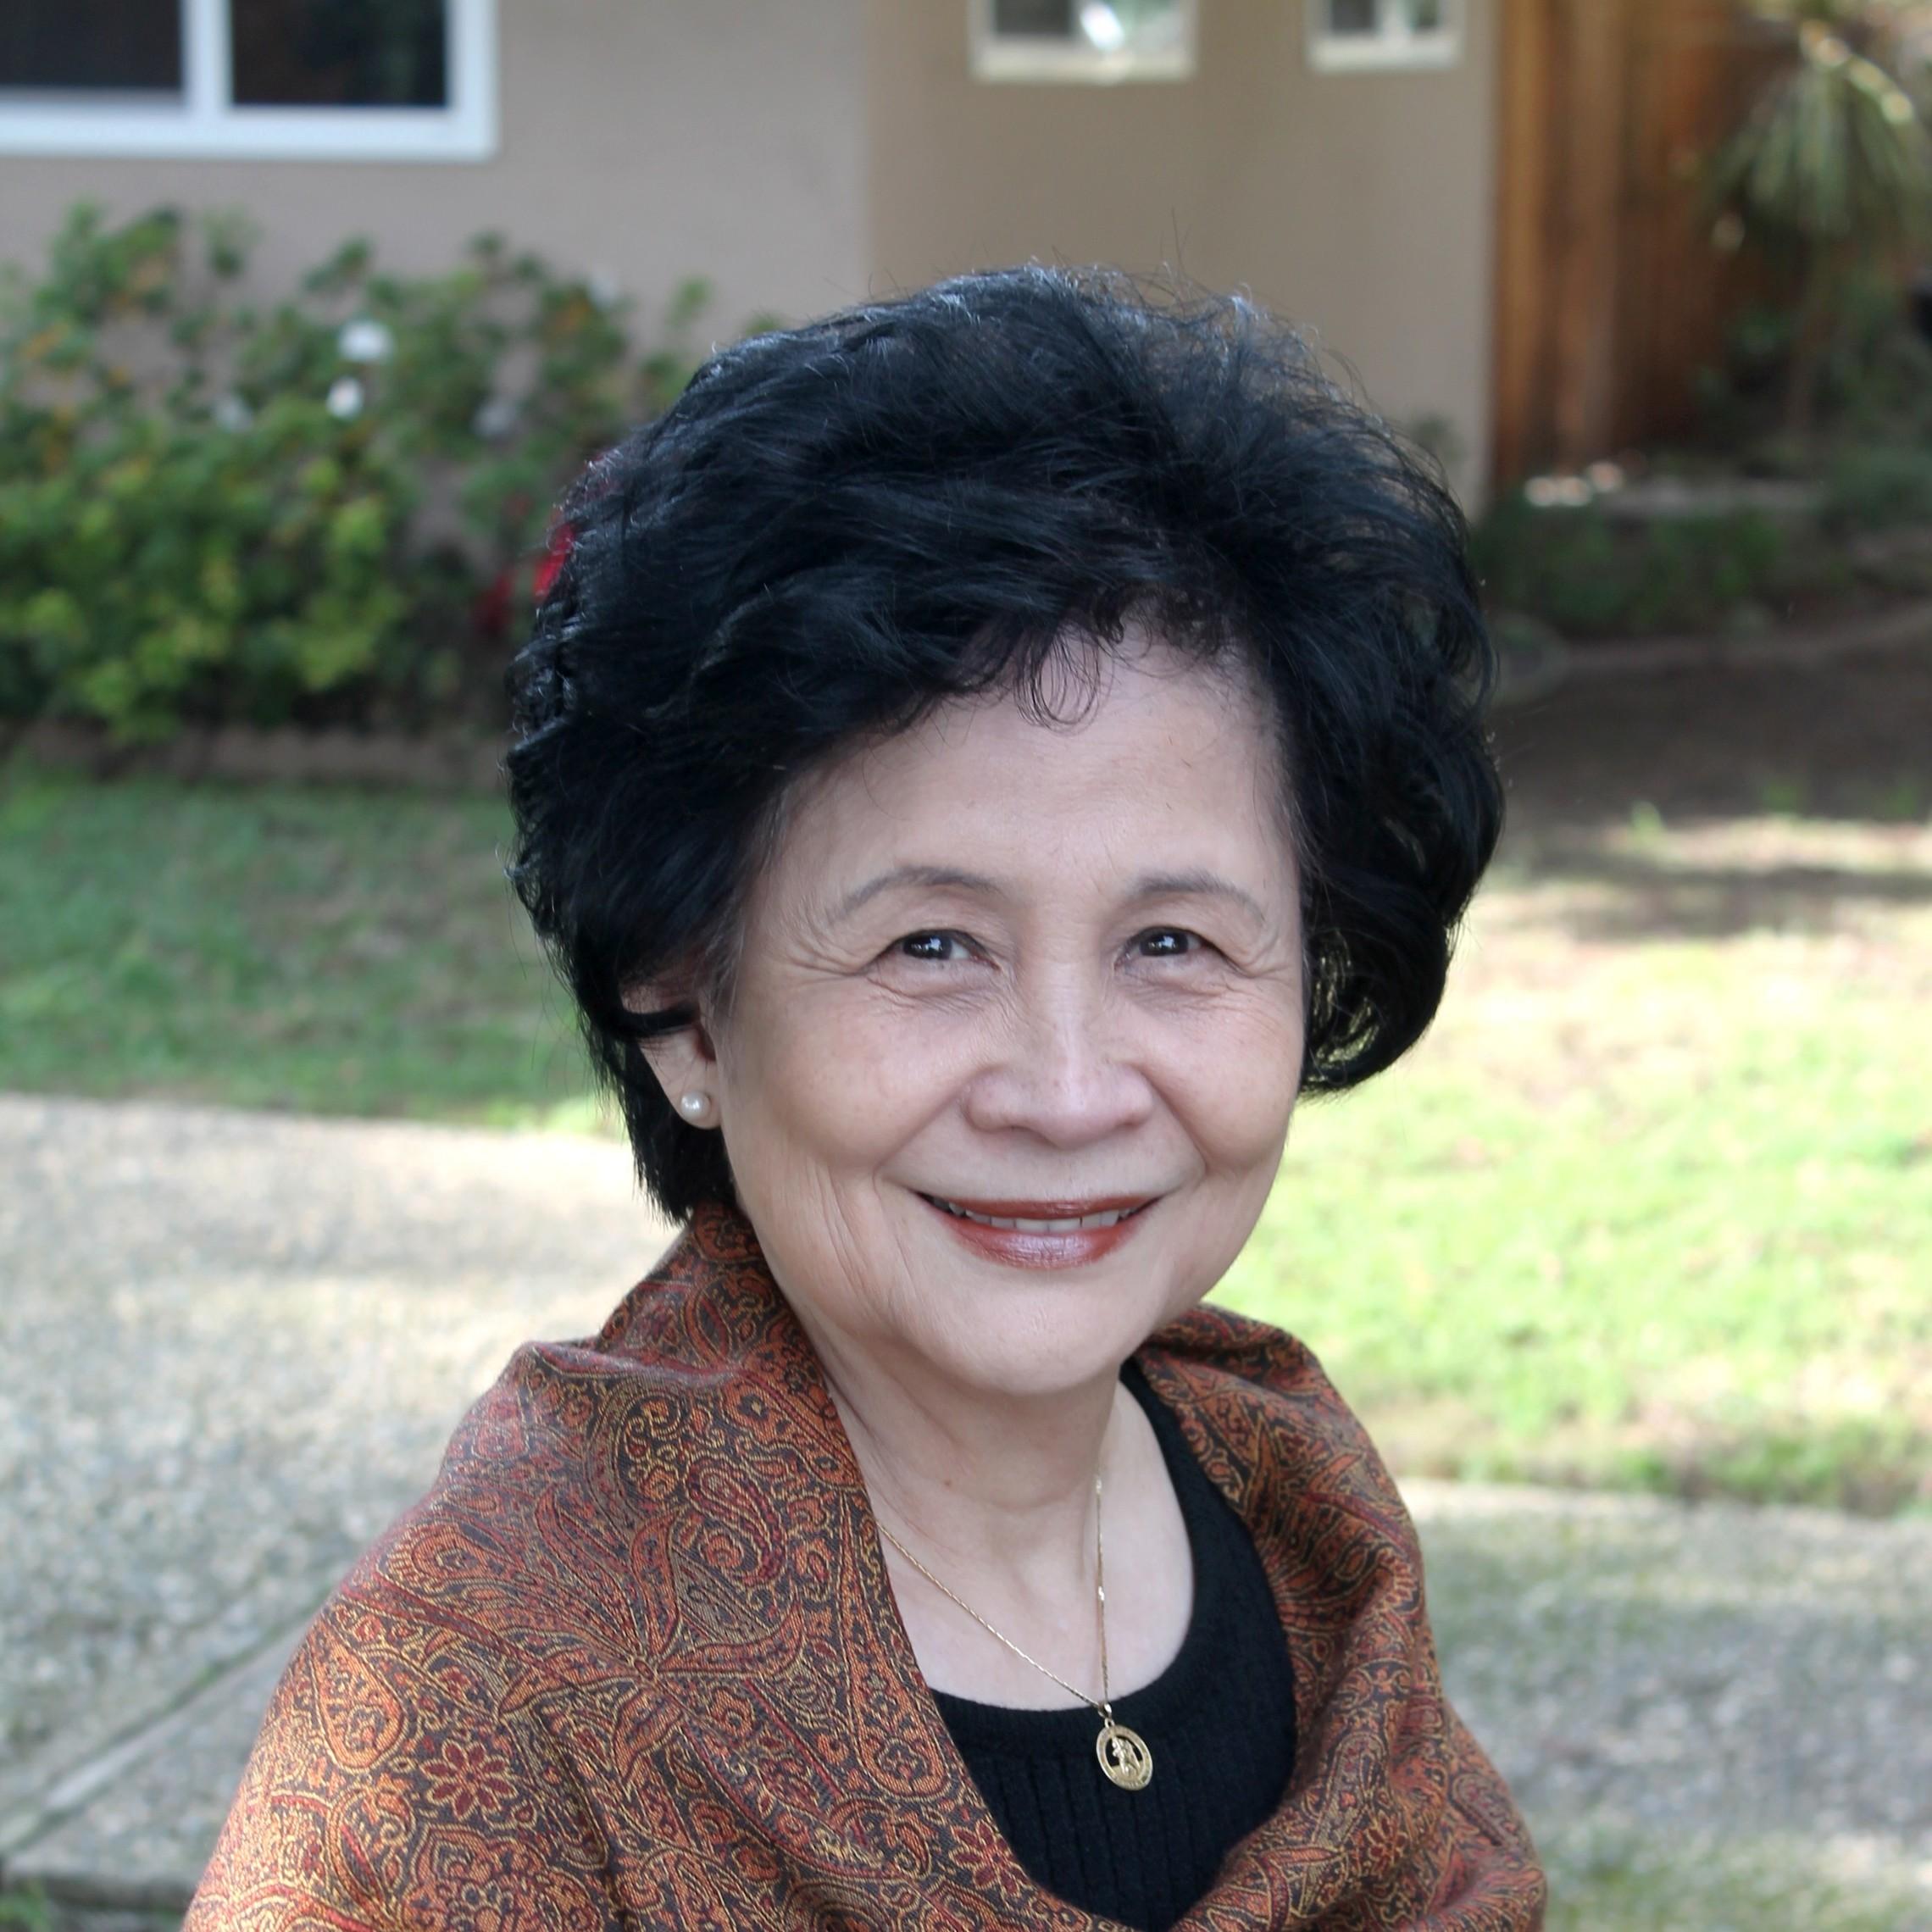 Nina Garrido